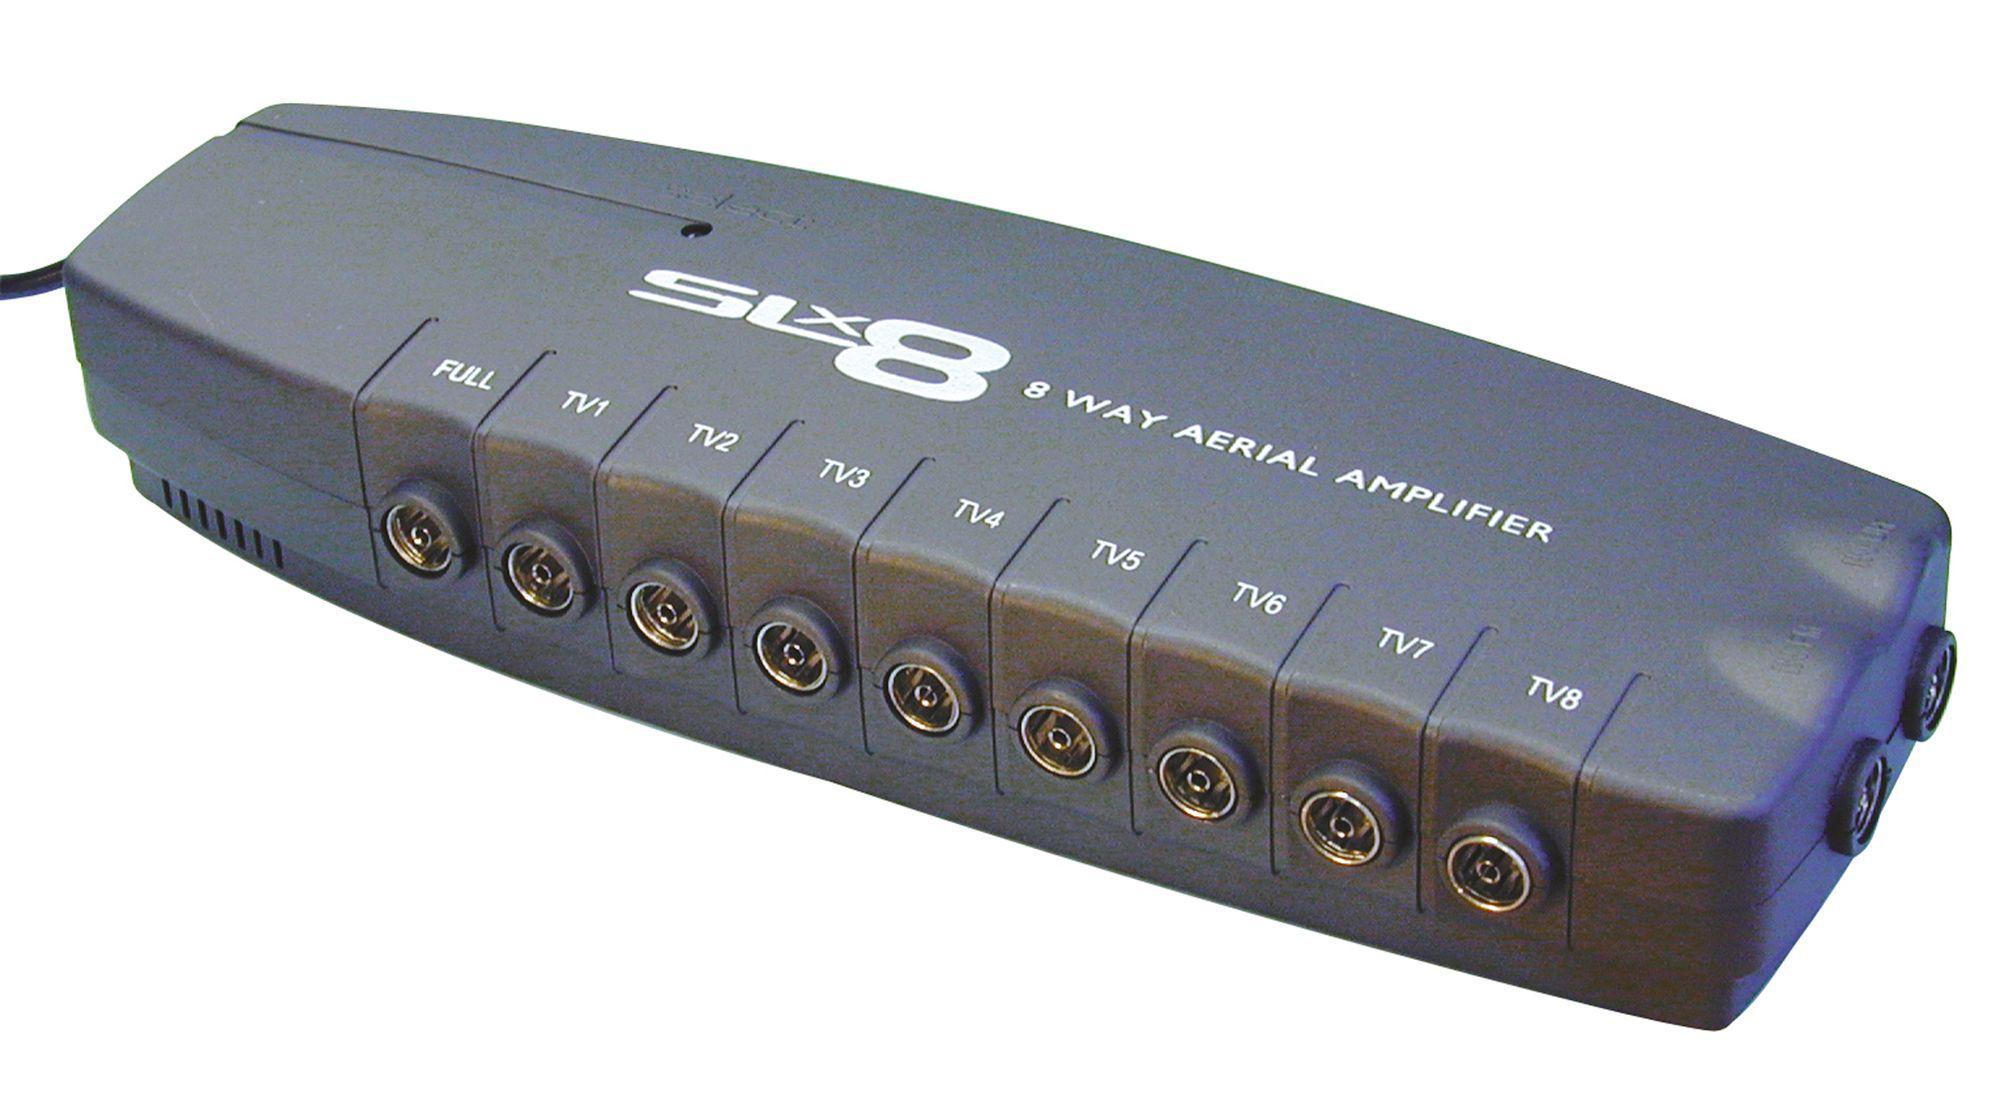 tristar 8 8 way pro amplifier departments diy at b q slx aerial amplifier